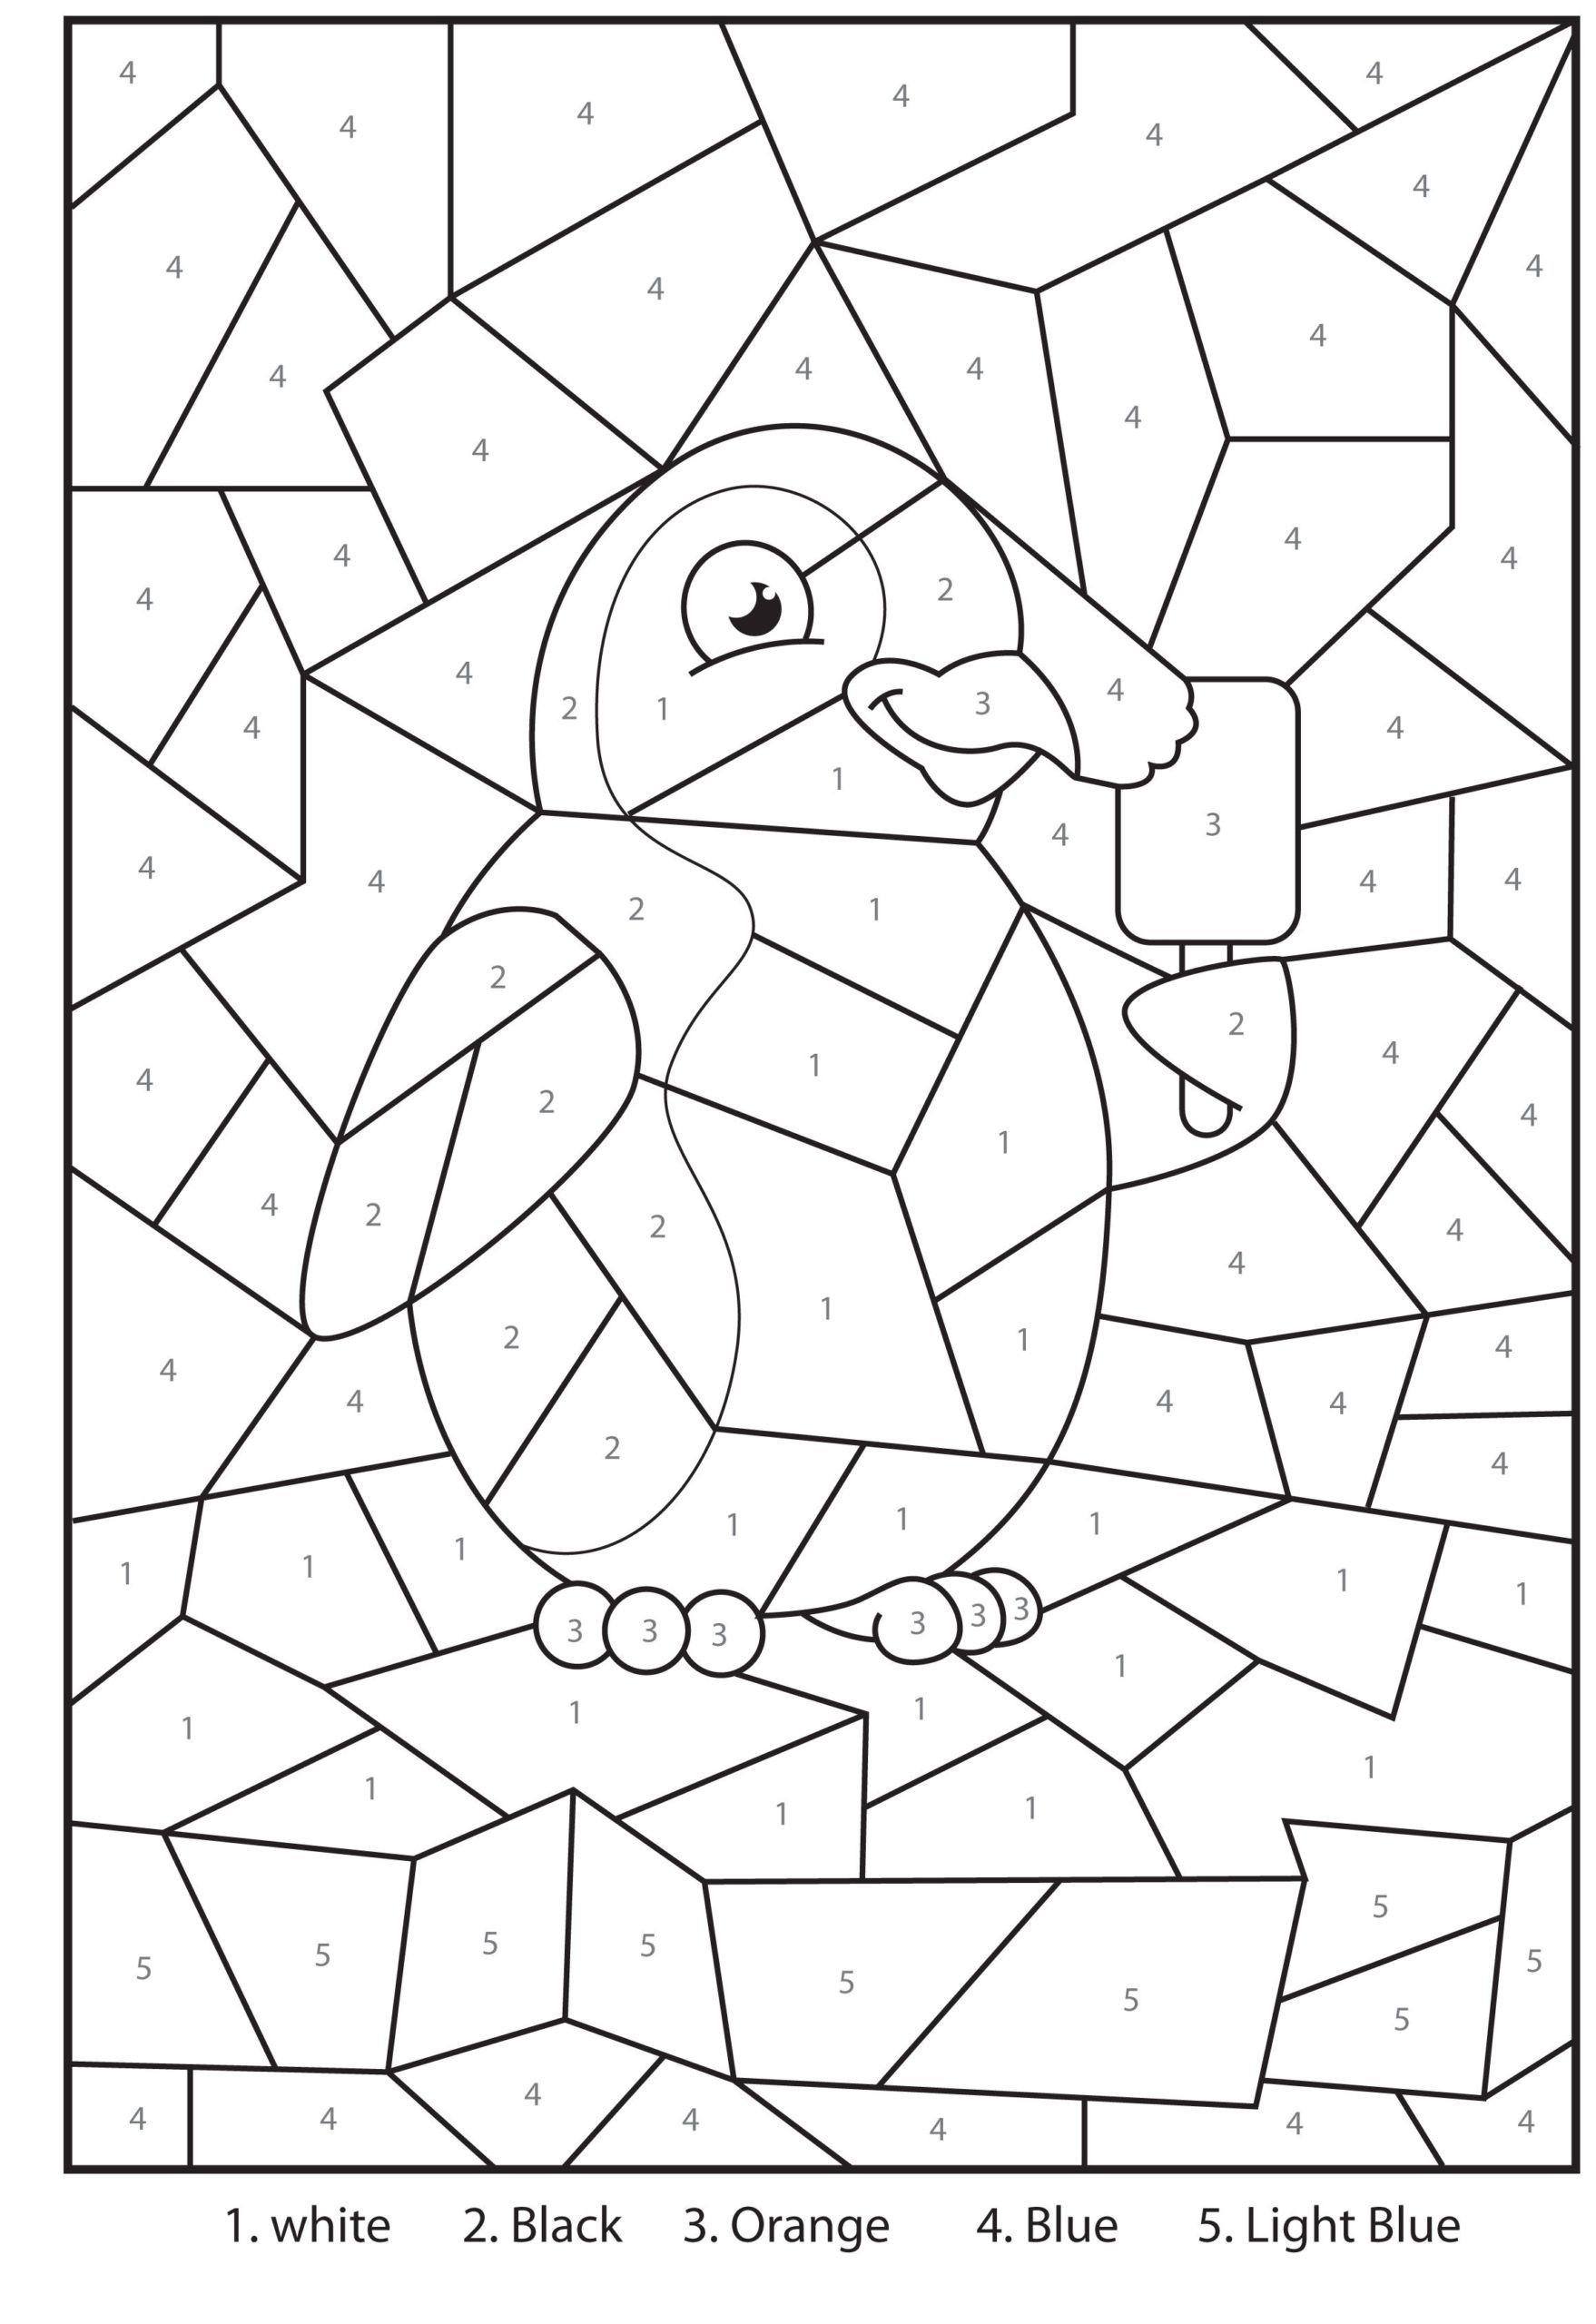 Number Bond Worksheets Kindergarten In